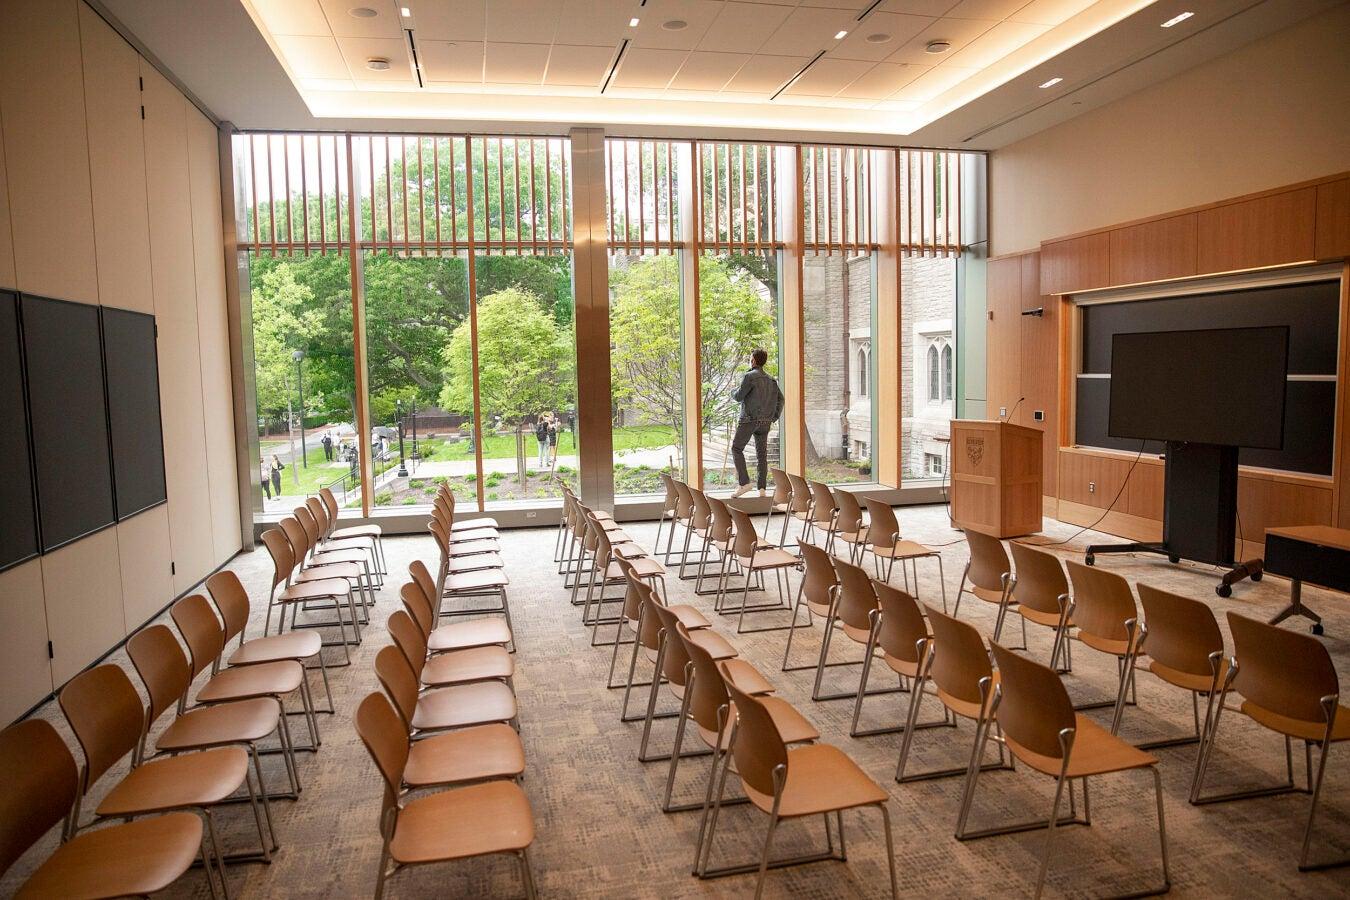 Swartz Hall classroom.